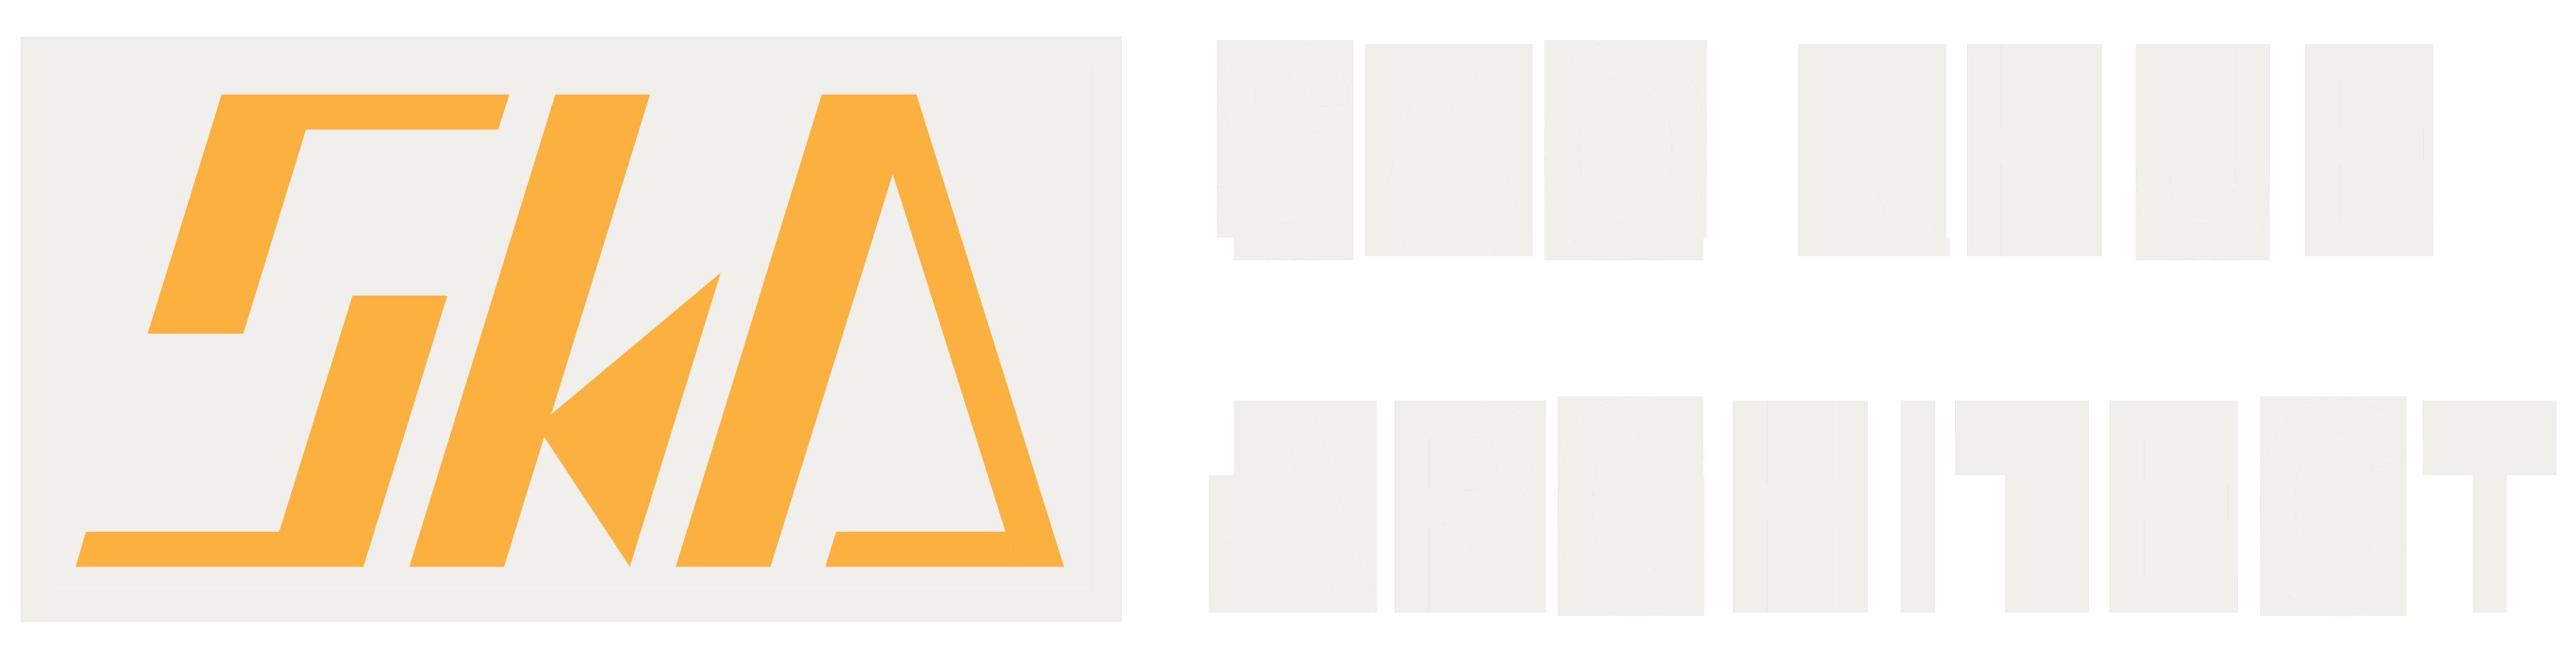 Sao Khuê Architect